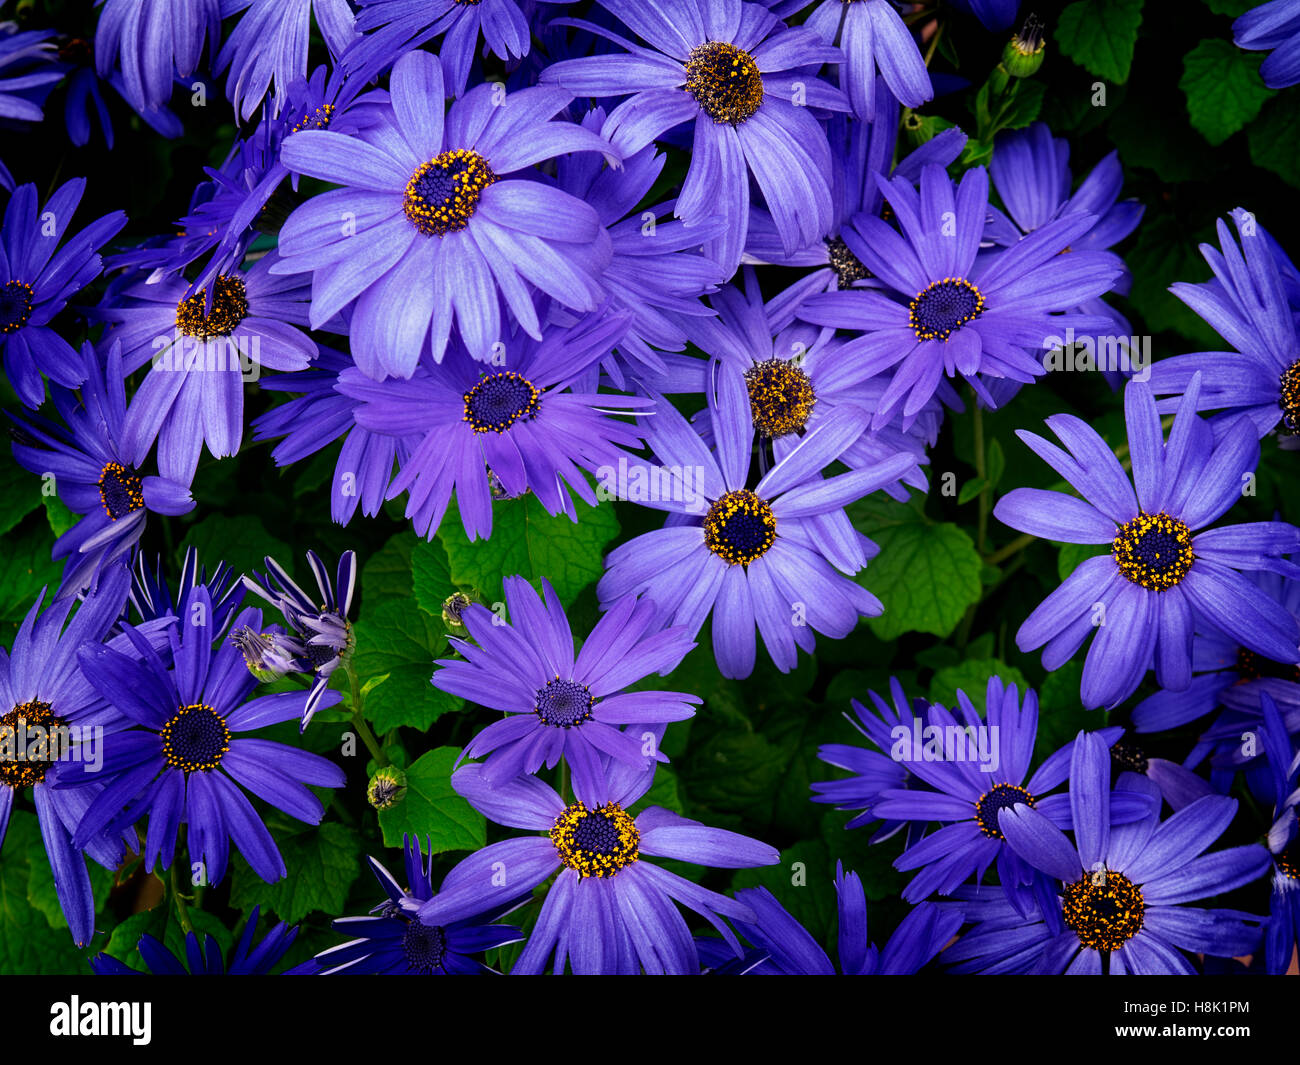 Close up of Senetti (Blue Sky) flowers. - Stock Image